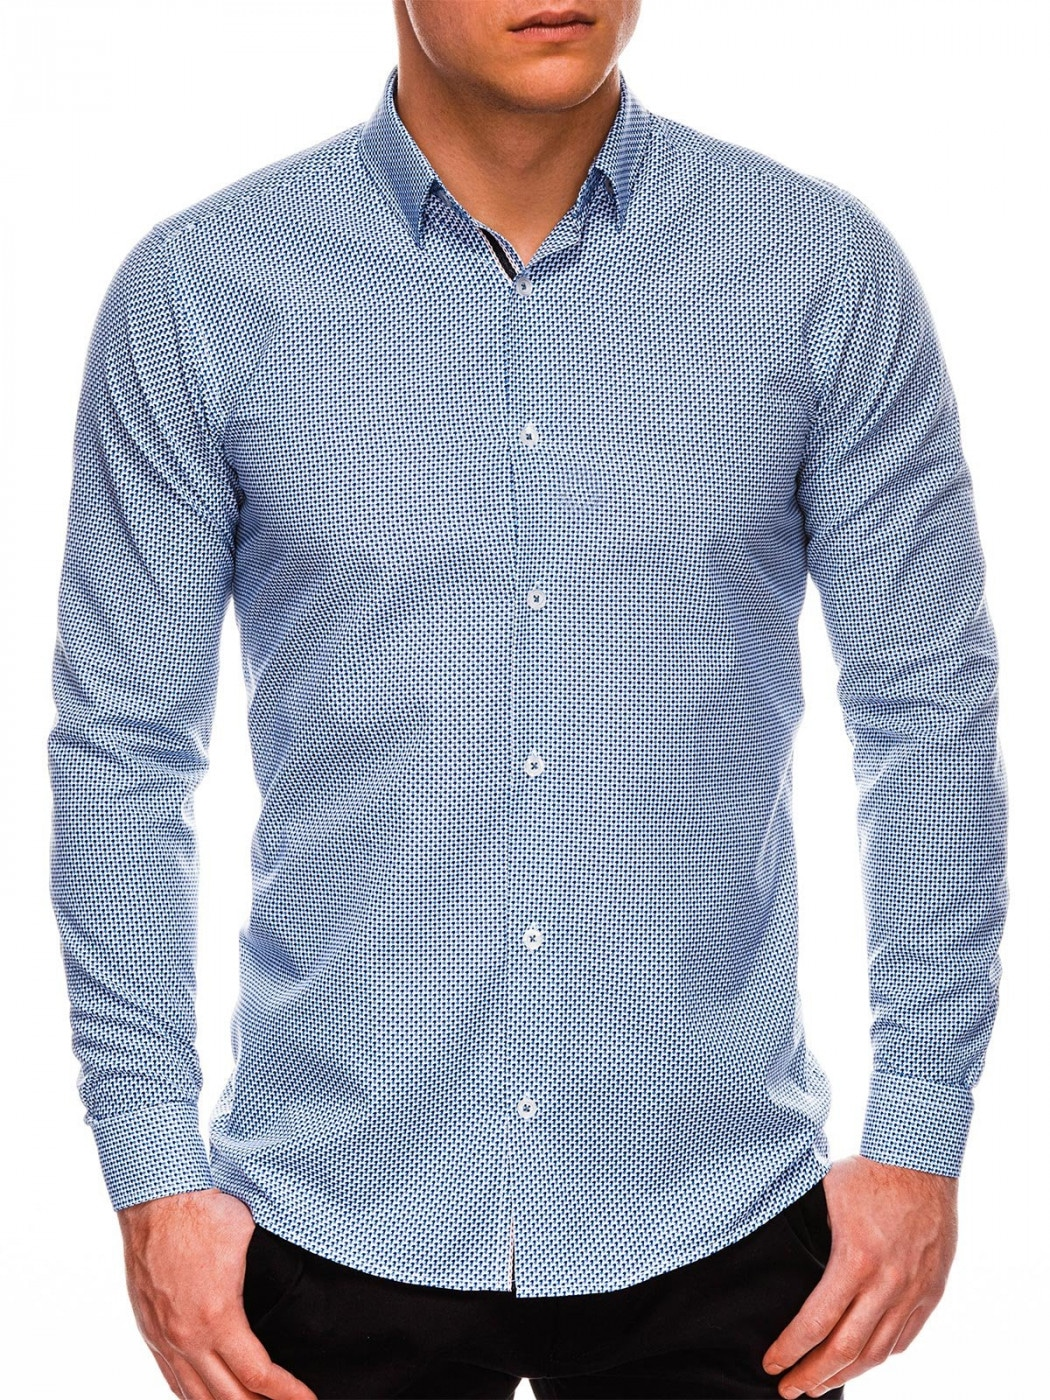 Men's shirt Ombre K535